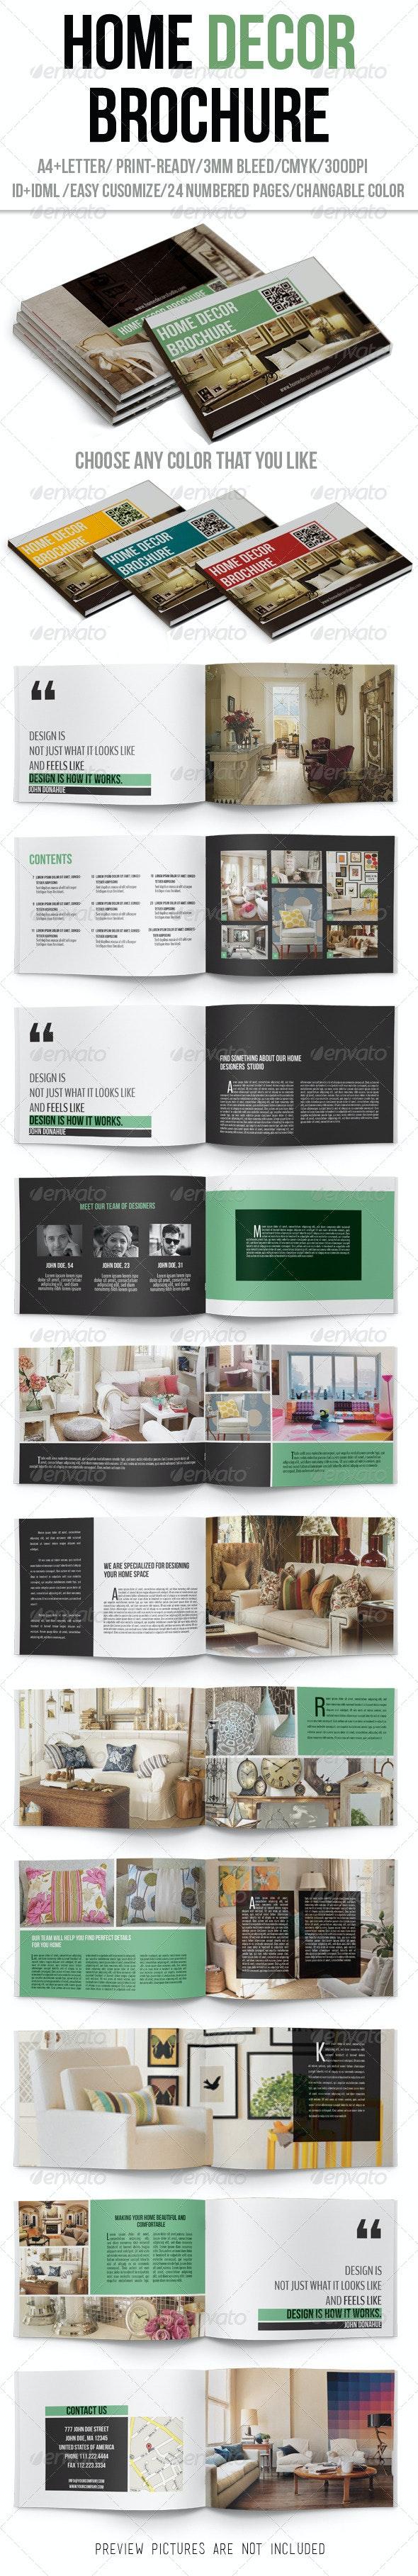 Home Decor Brochure - Catalogs Brochures